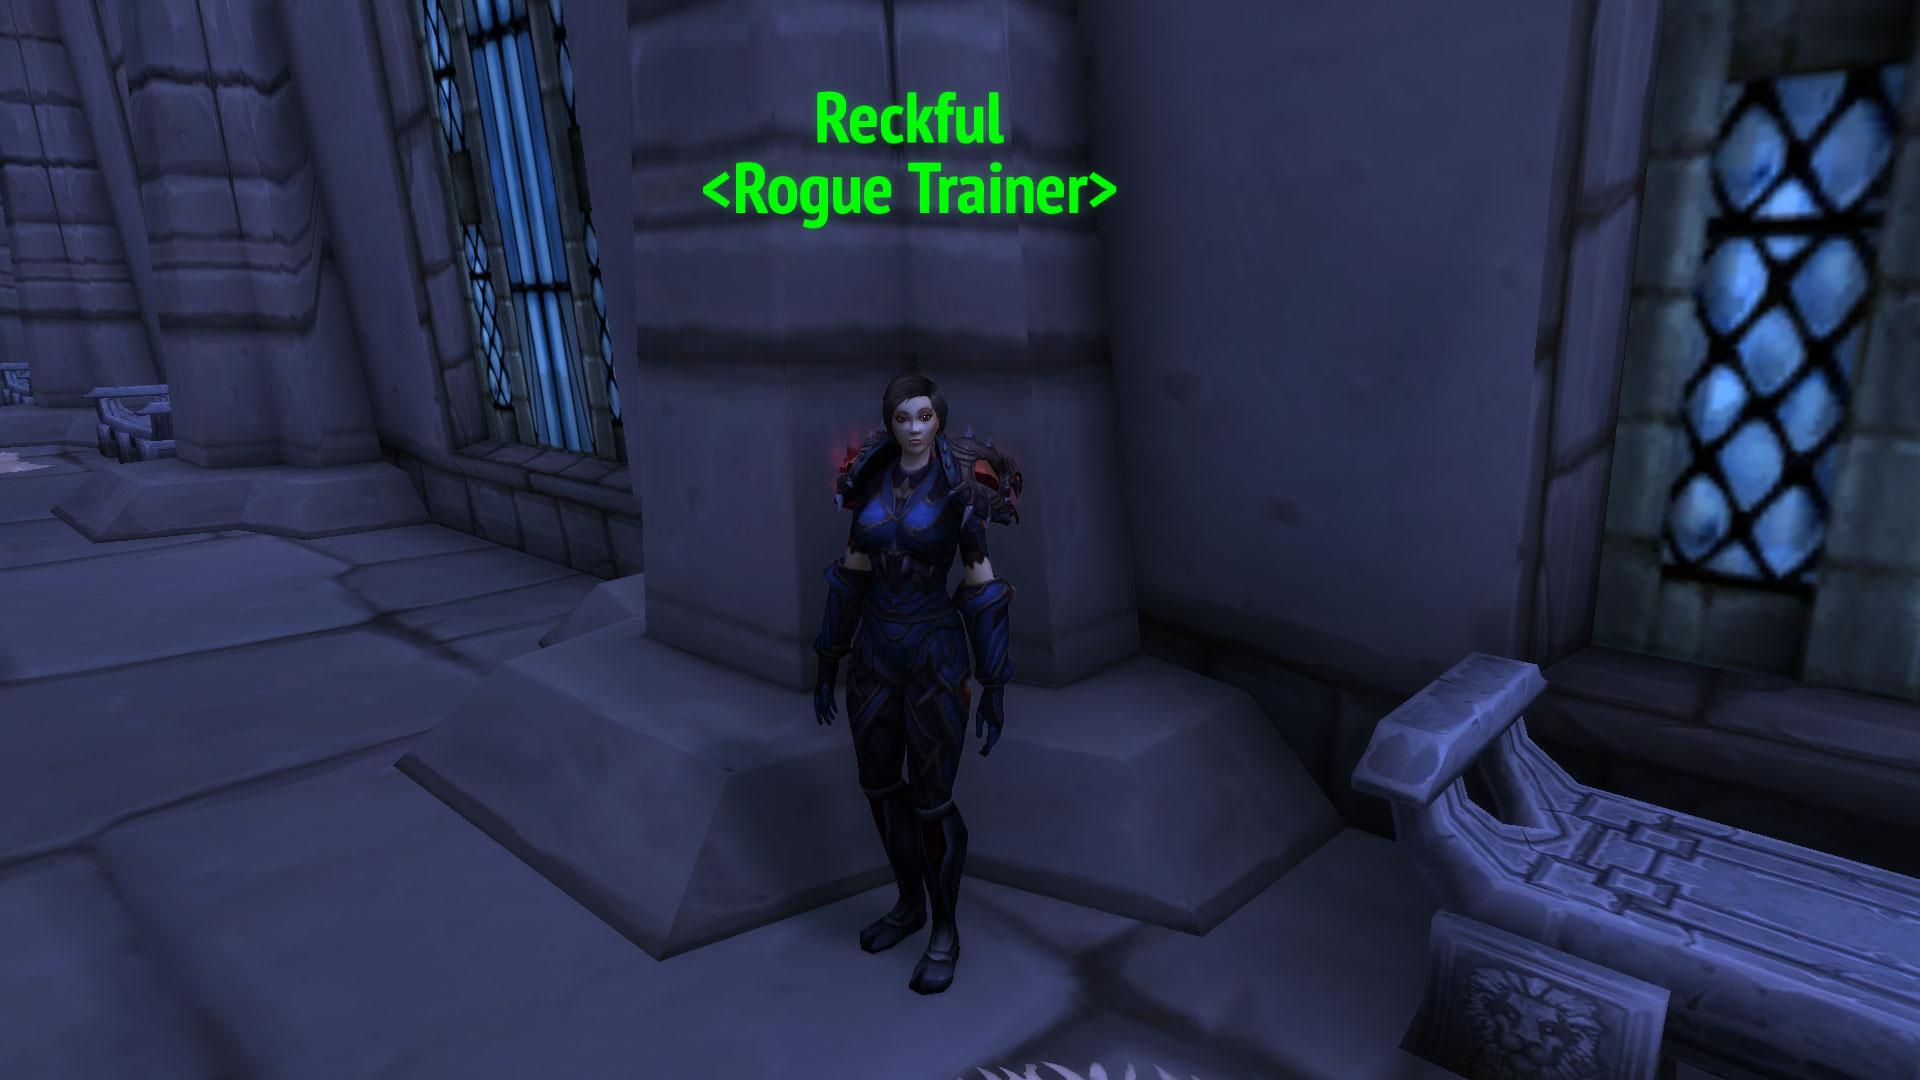 Reckful NPC in World of WarCraft